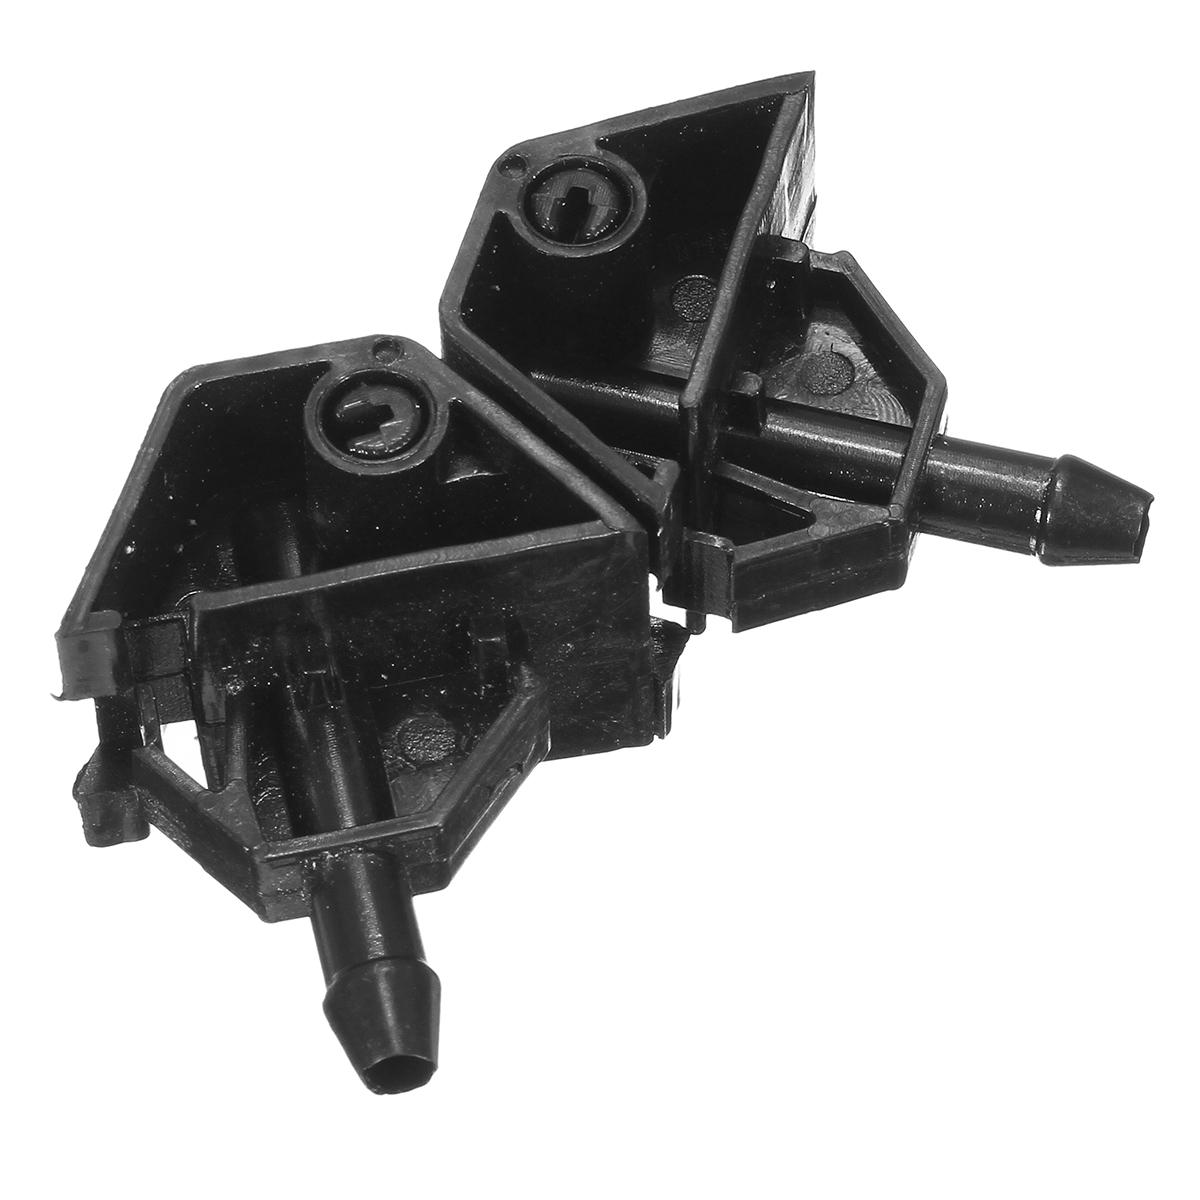 Car Windshield Washer Sprayer Nozzle Washer Jet For Nissan Qashqai 2008-2014